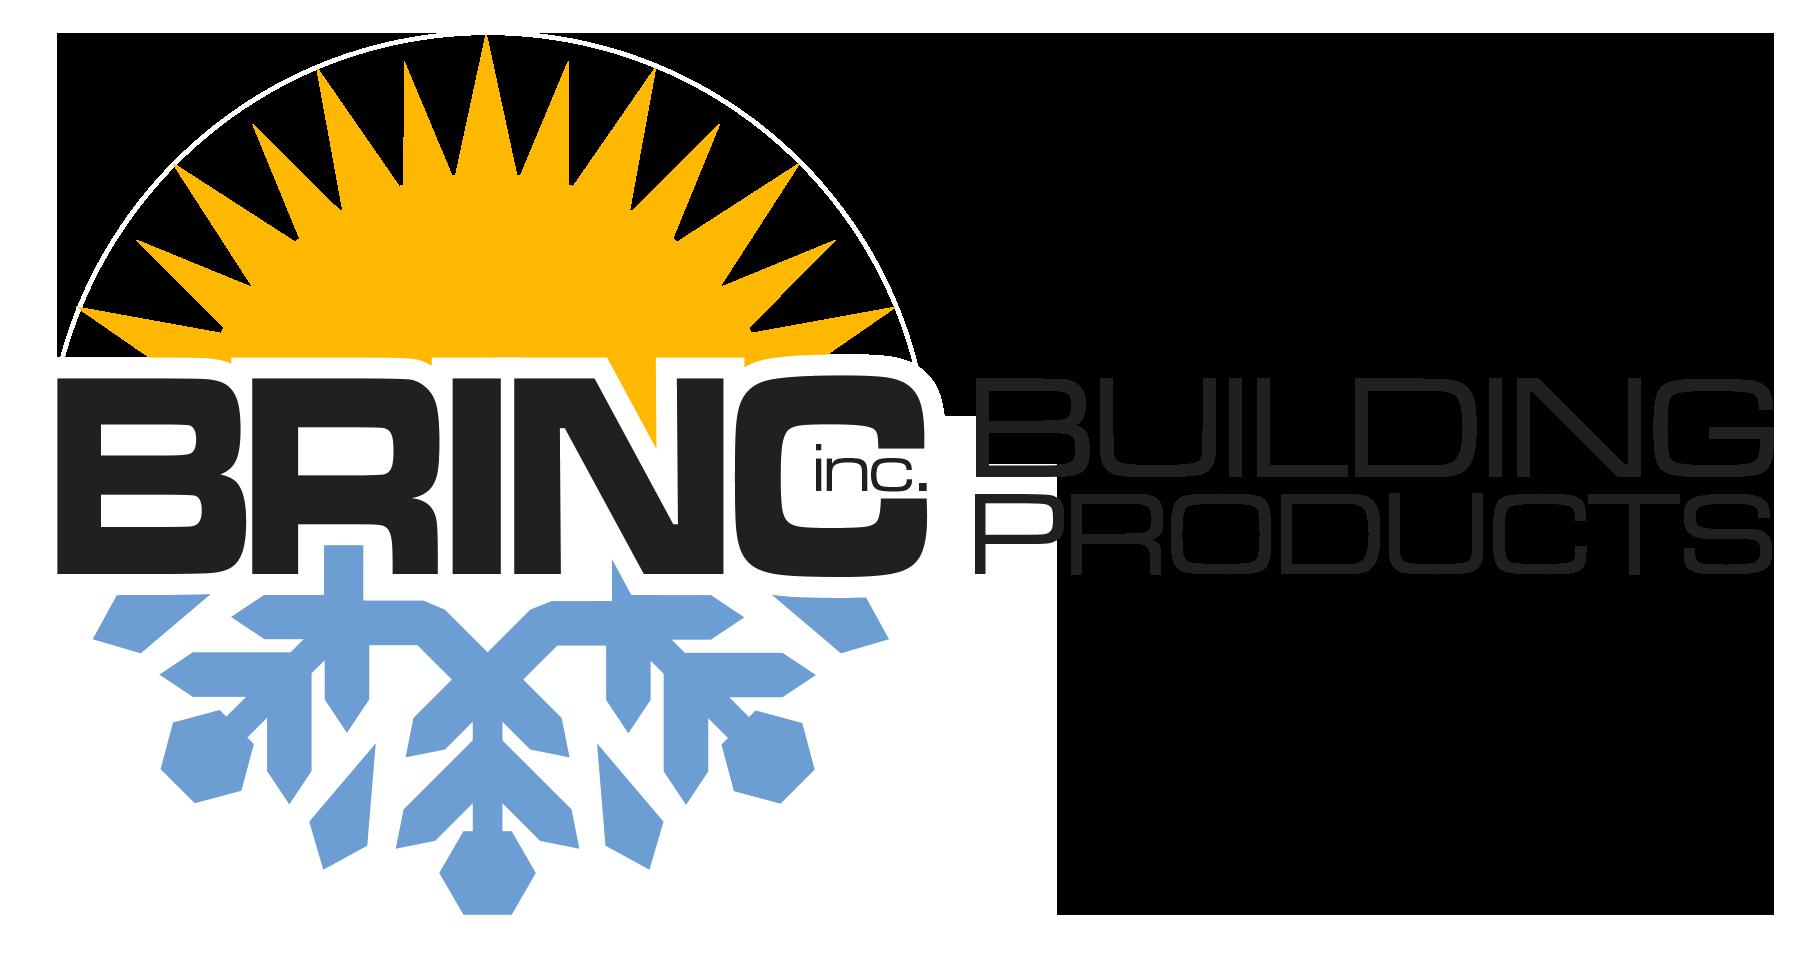 BRINC Building Products, Inc.